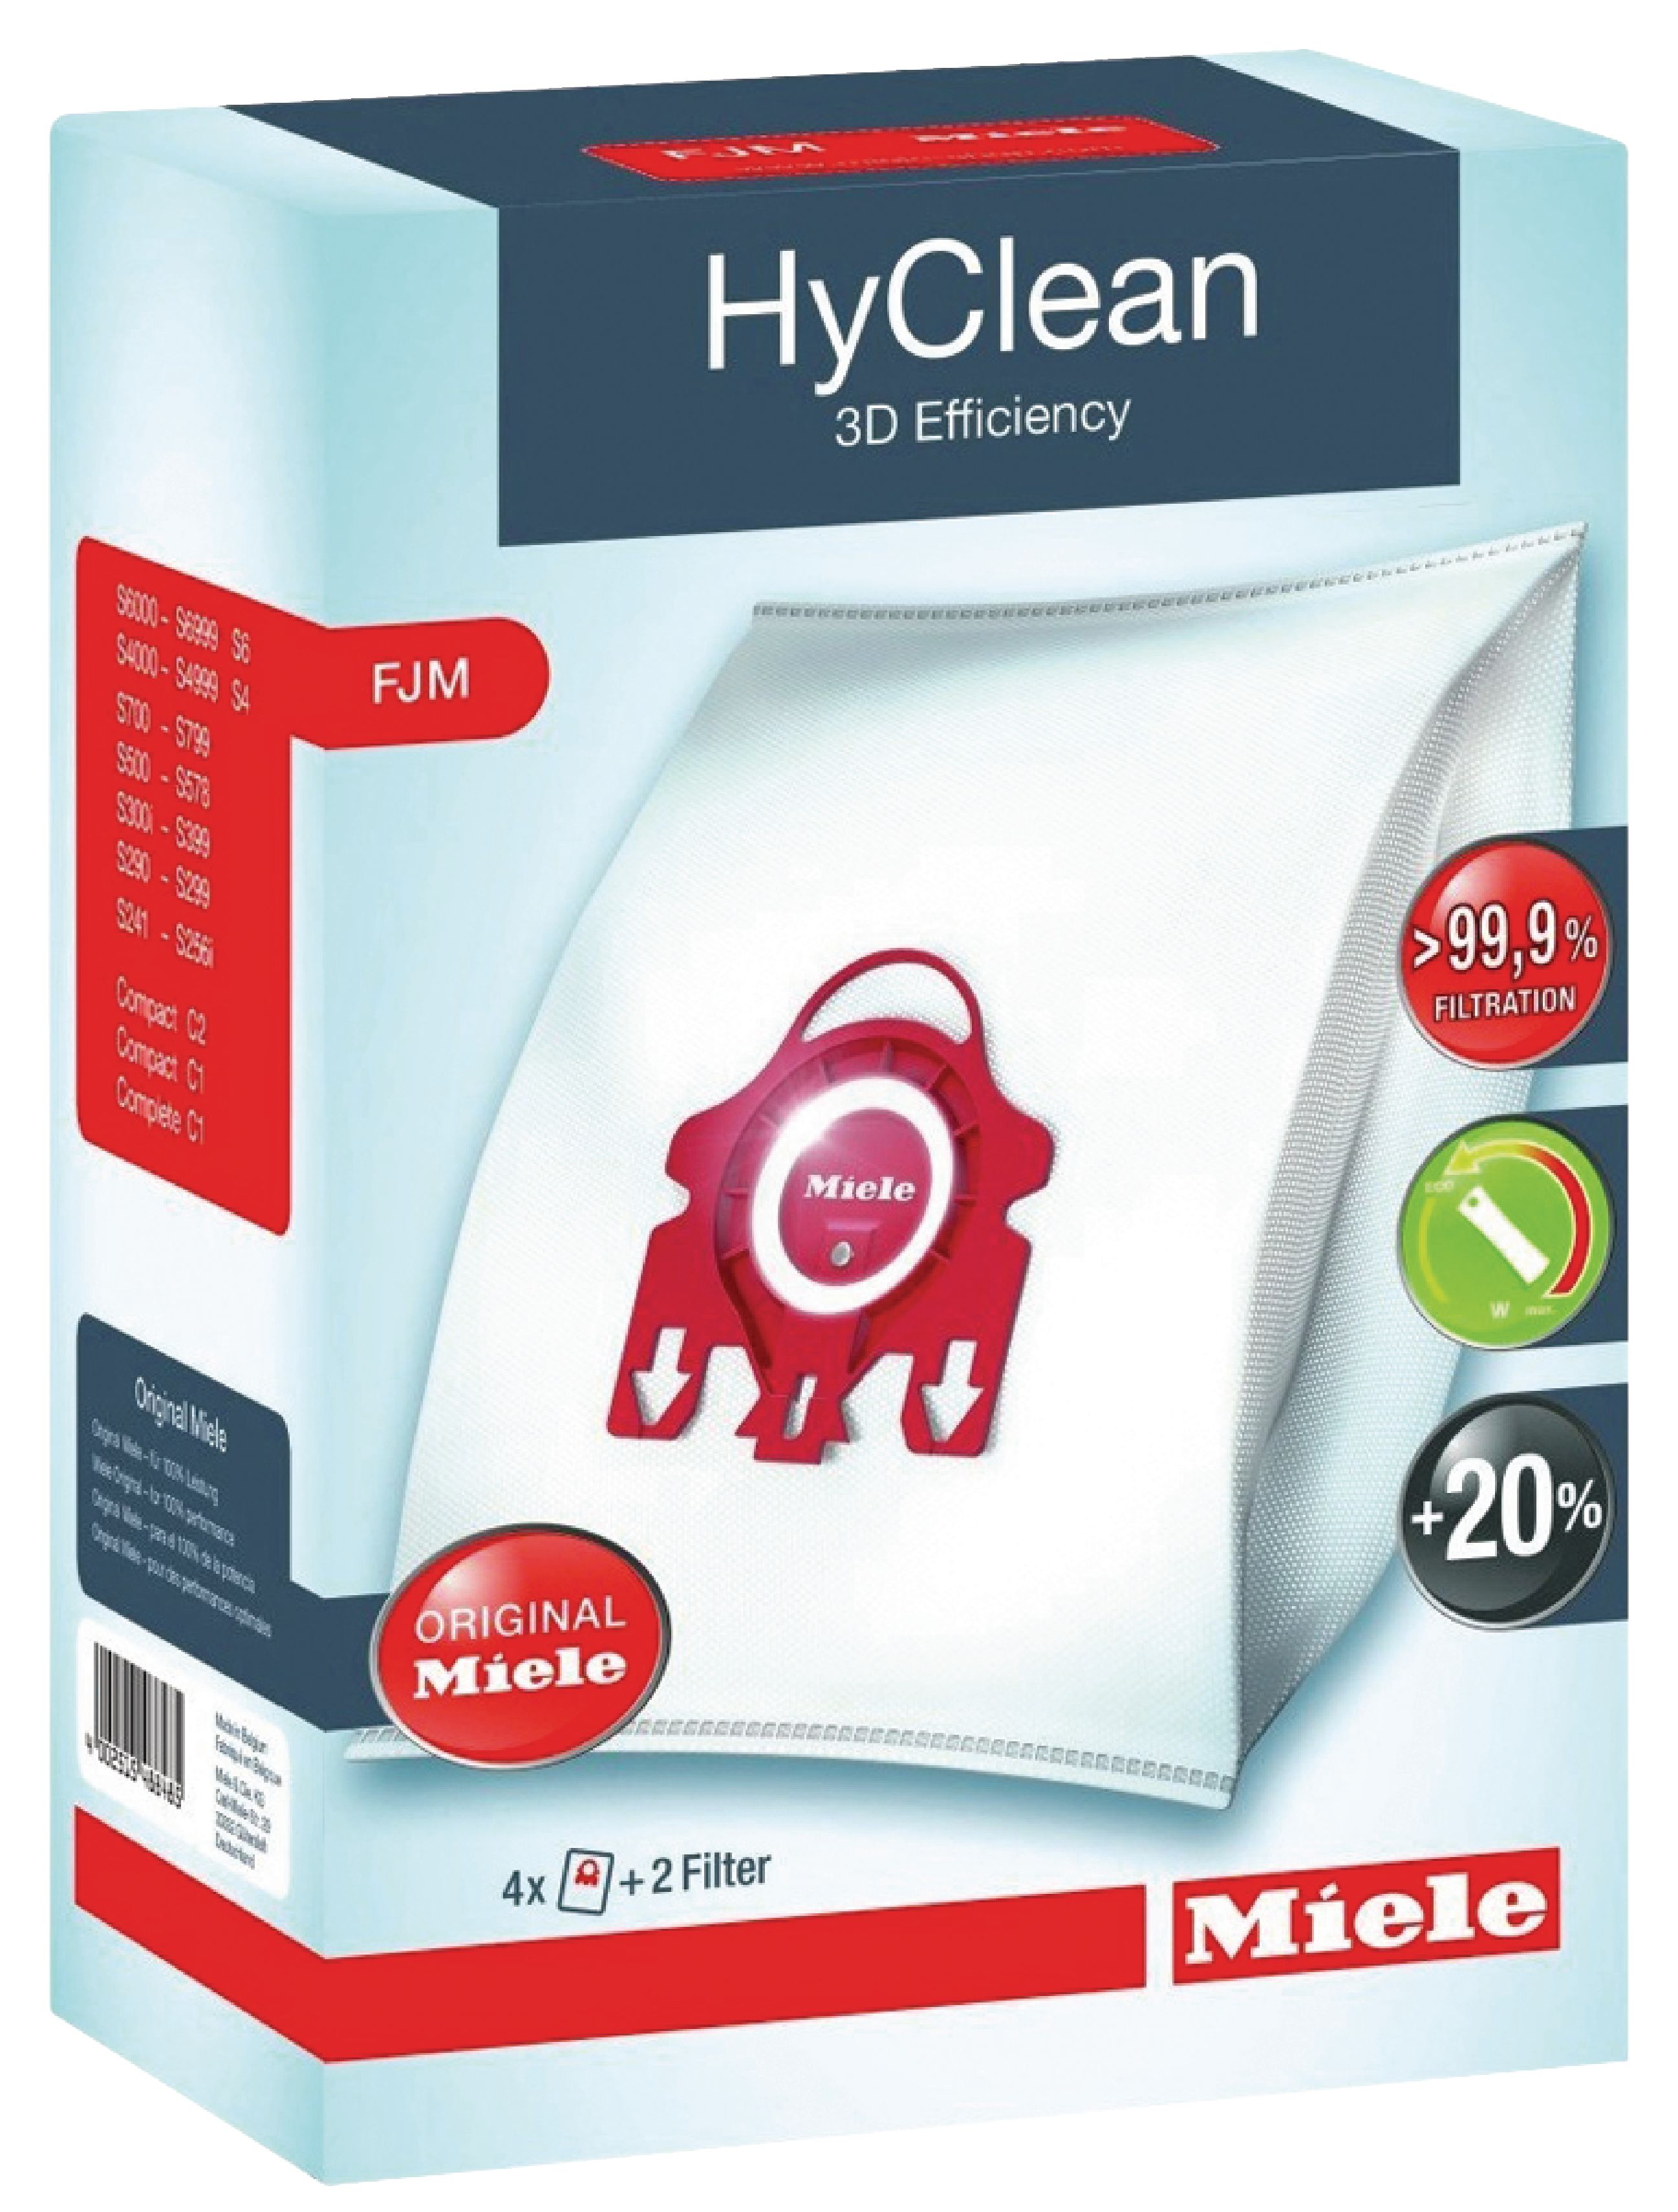 Sáčky Miele HyClean 3D Efficiency FJM, 4ks 9917710